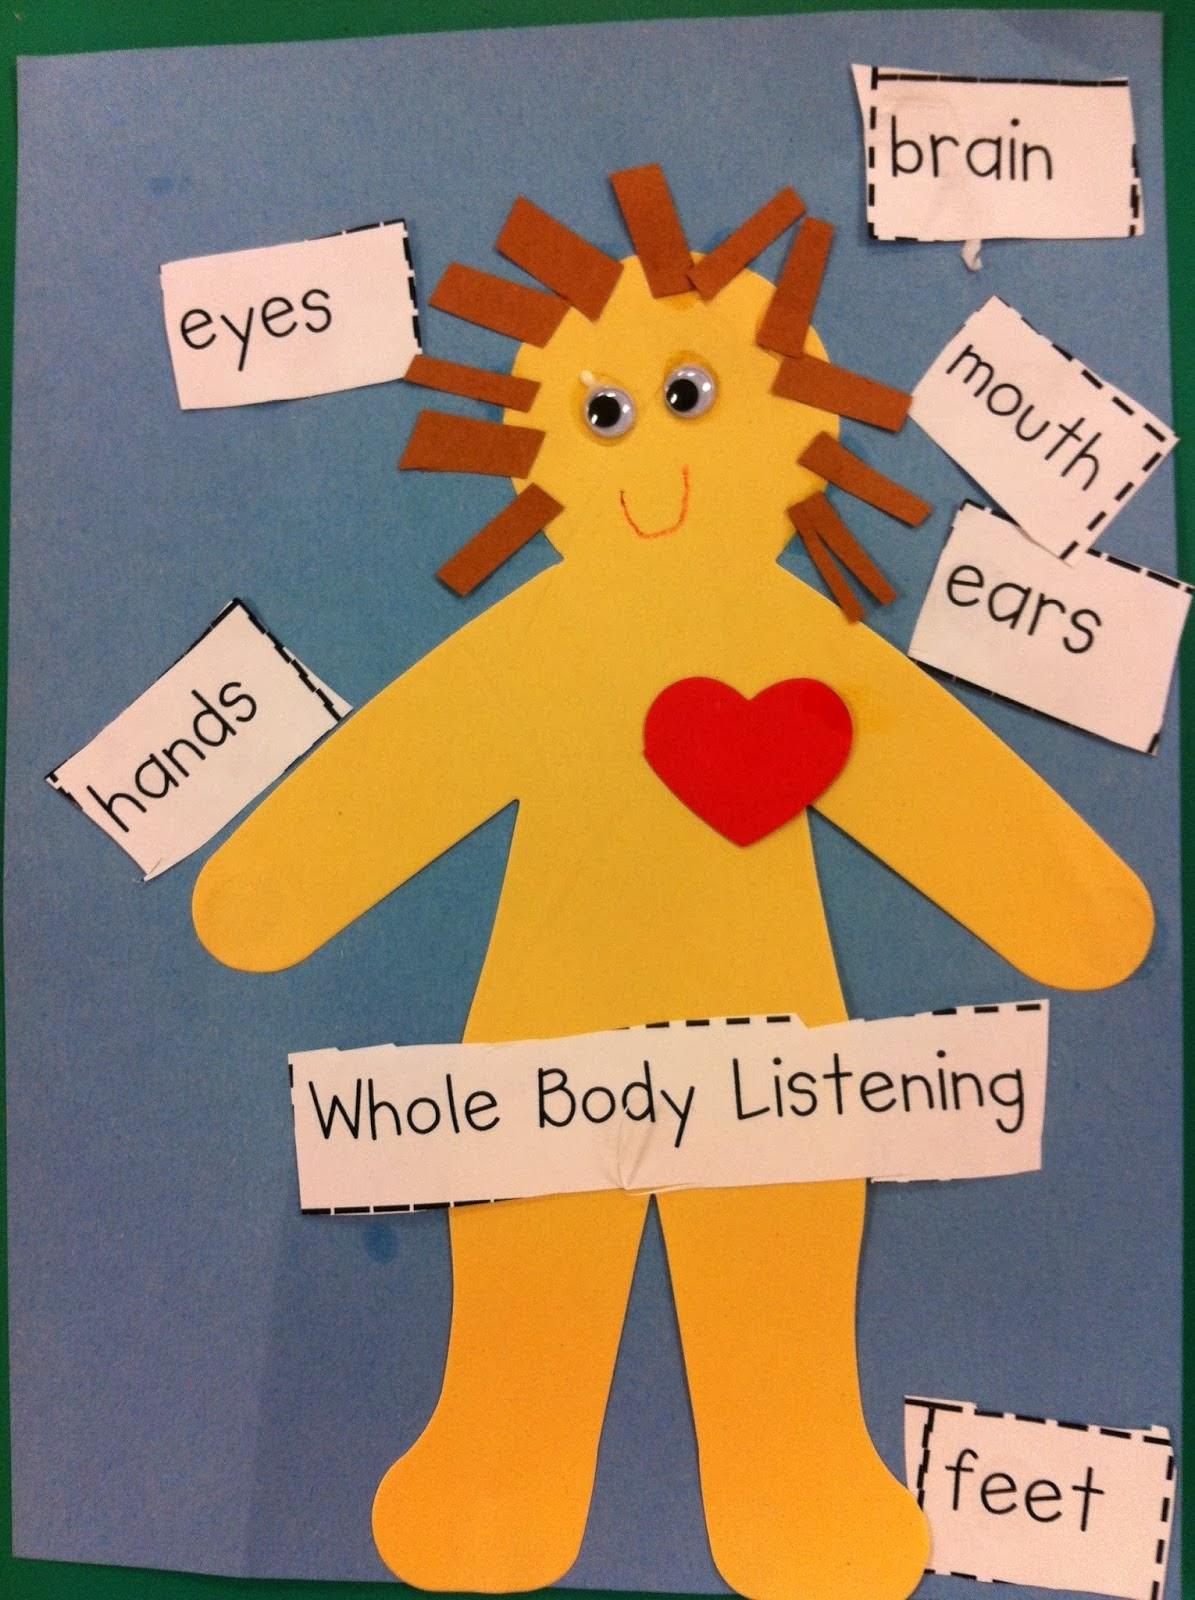 Meta Vie Whole Body Listening